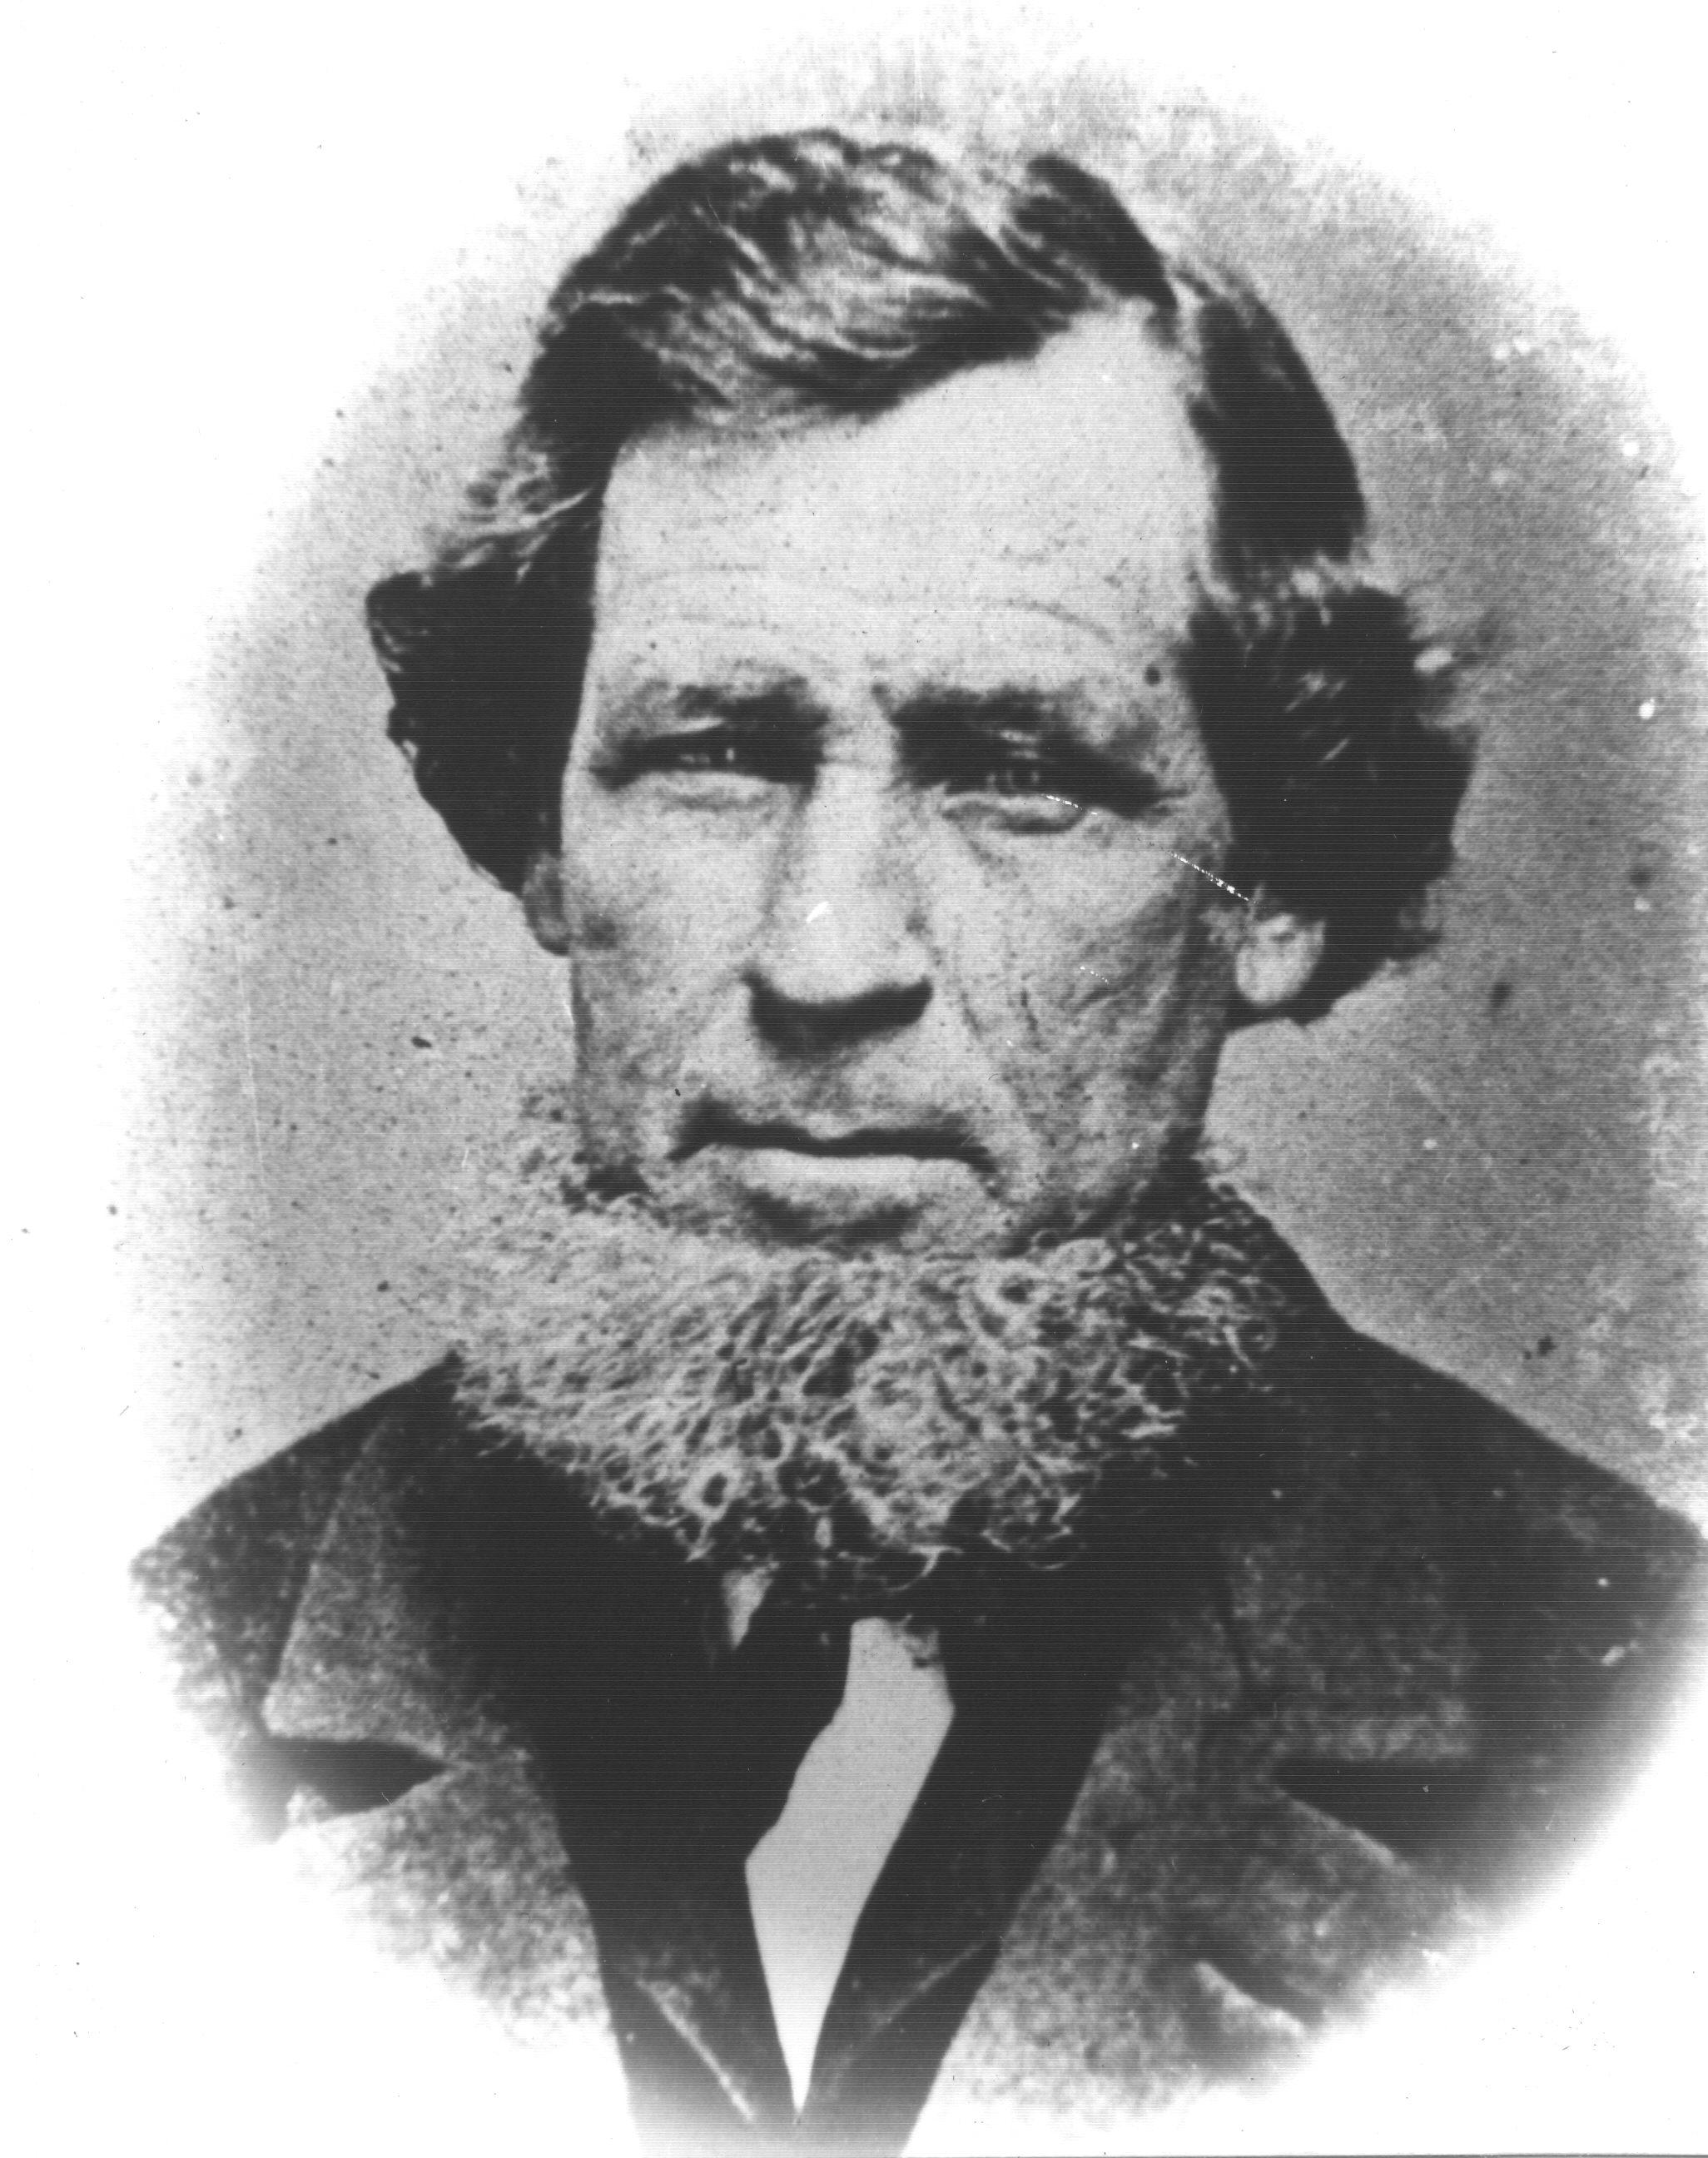 Vintage man with beard photo